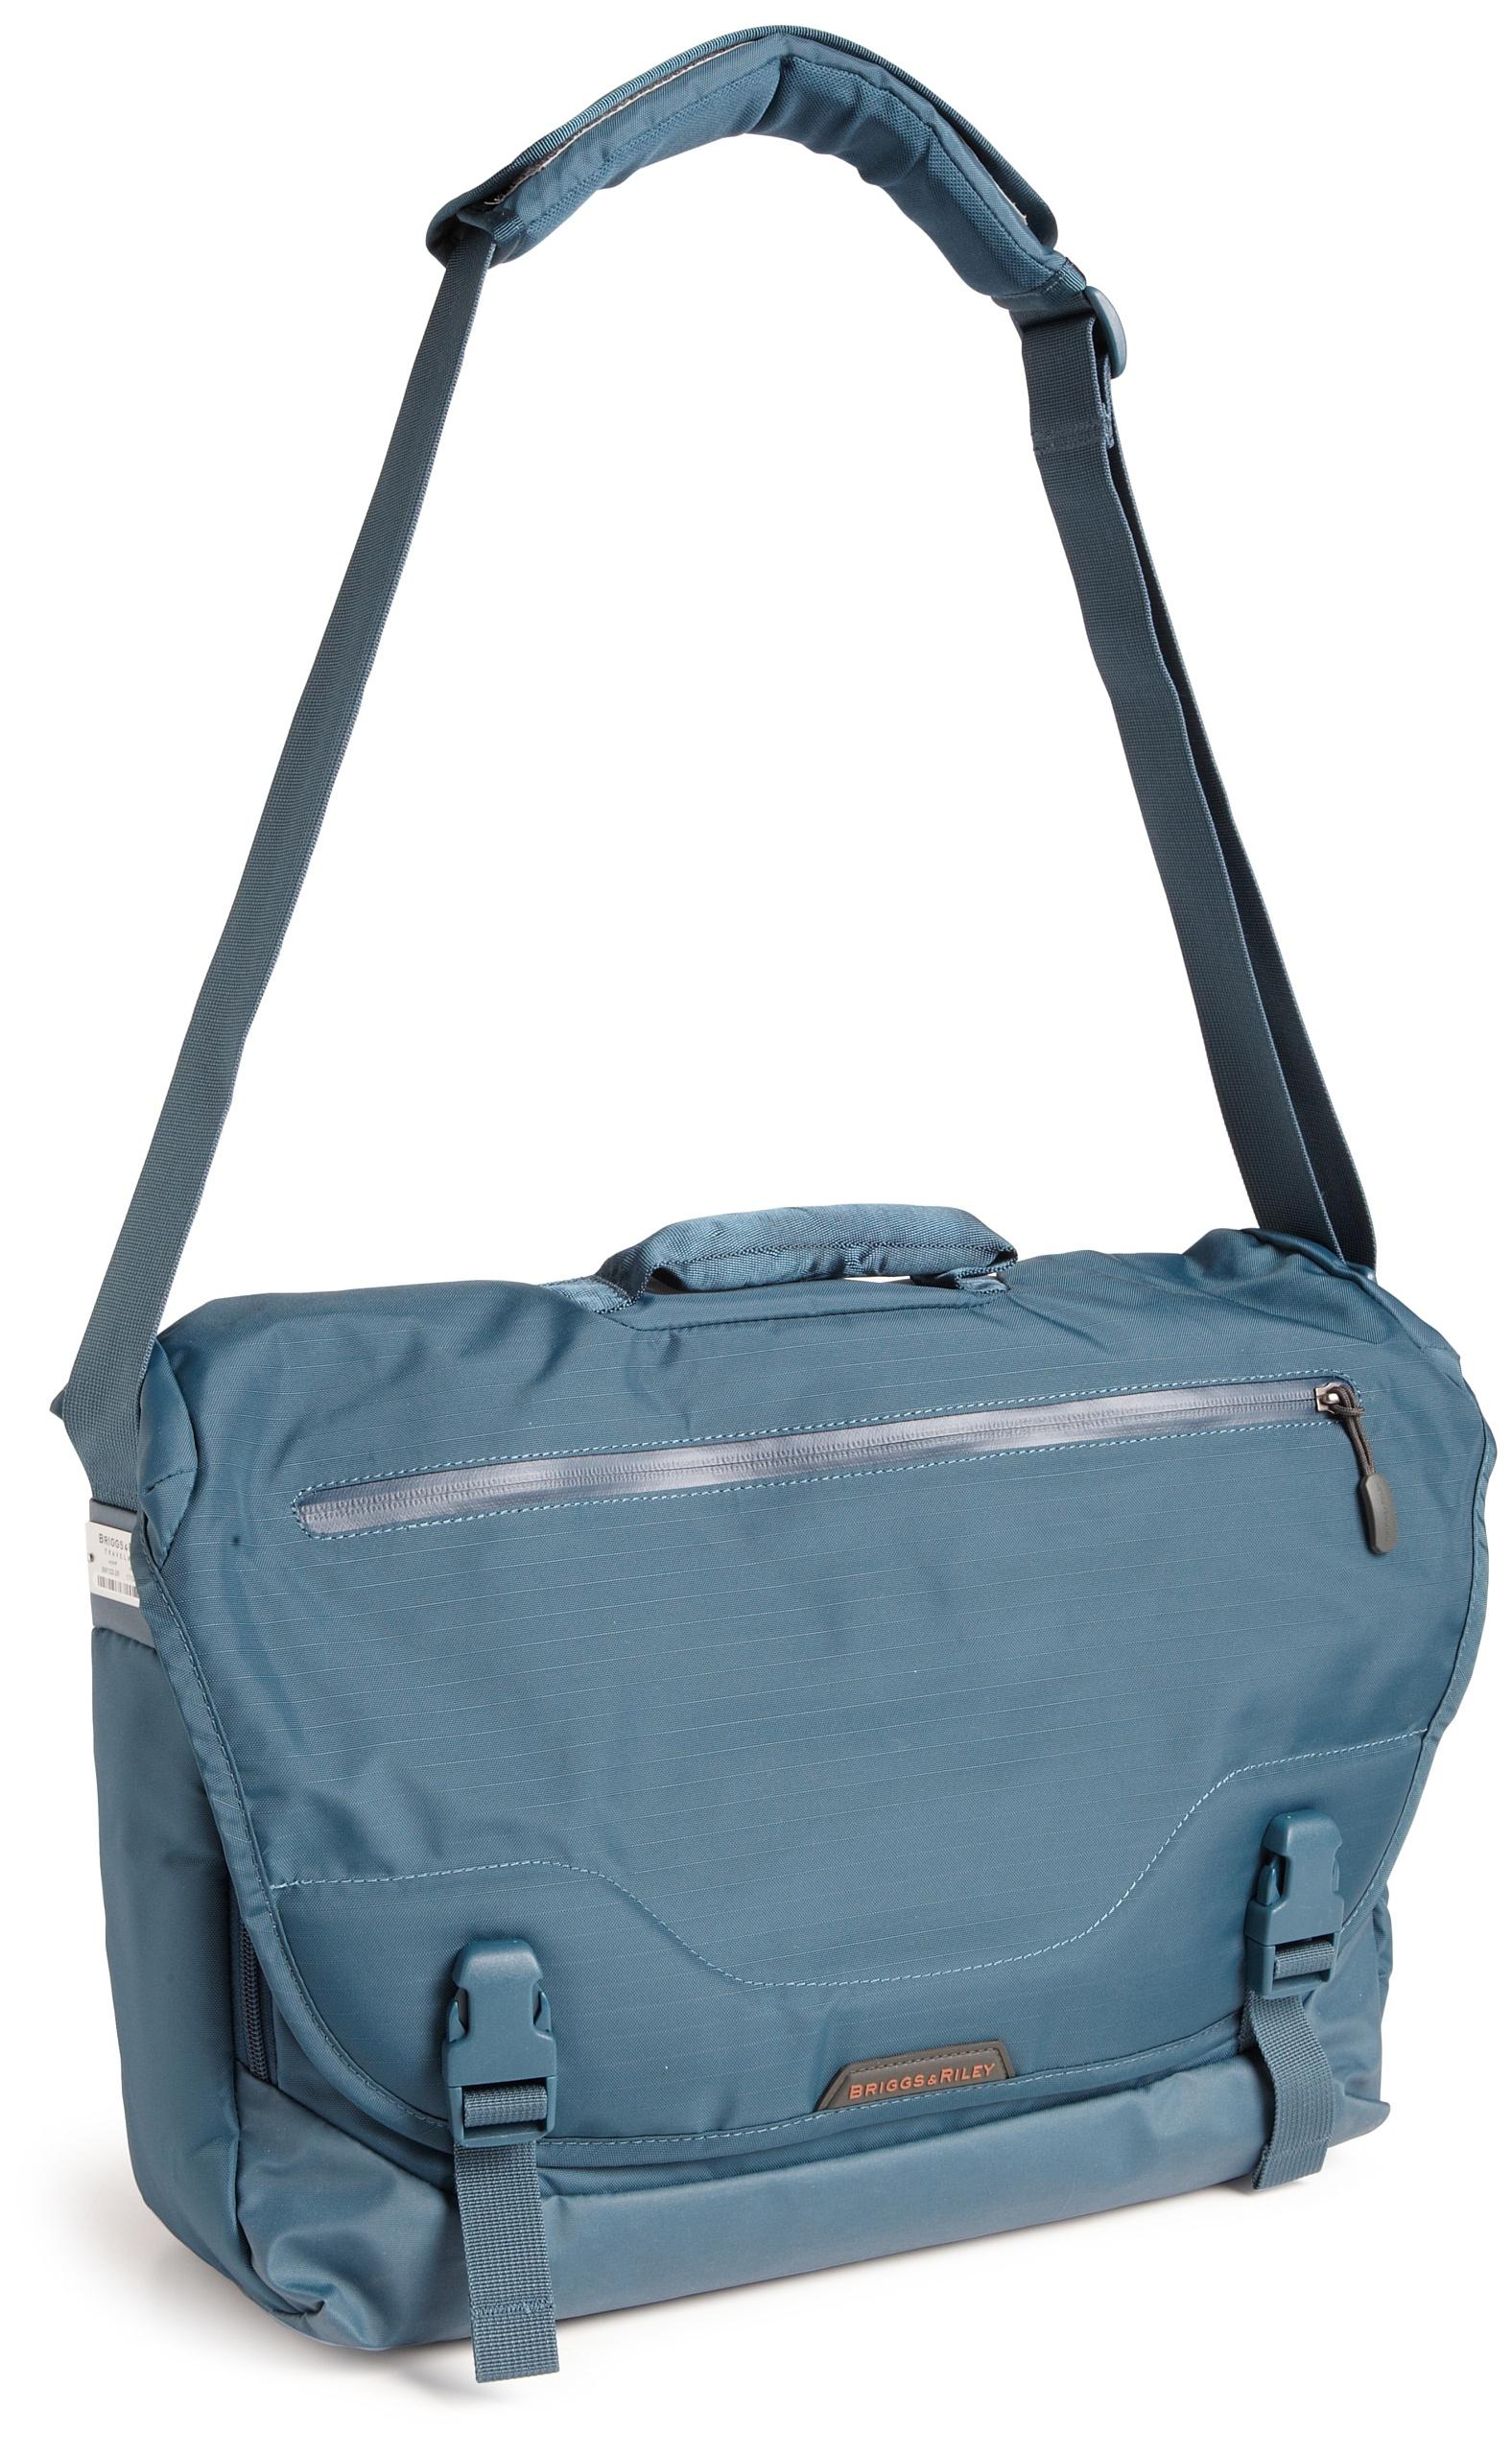 Briggs & Riley Luggage Excursion Messenger Bag, Ocean, Large